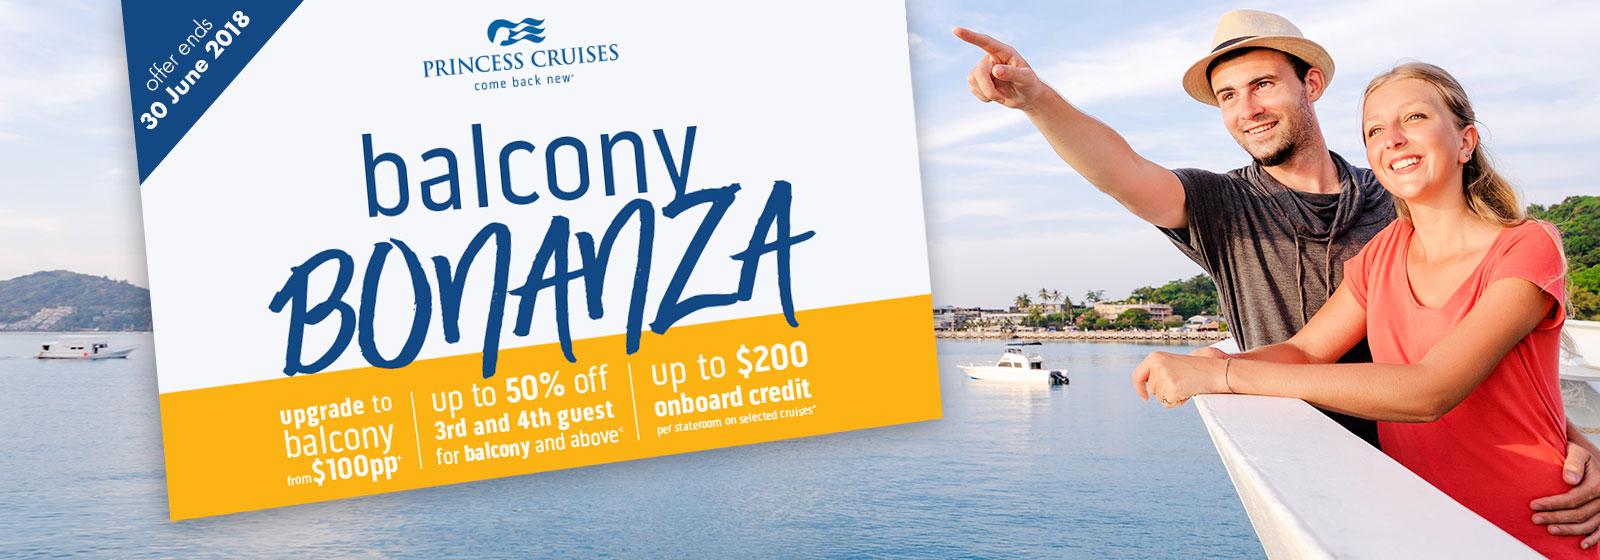 Princess Cruises | Balcony Bonanza